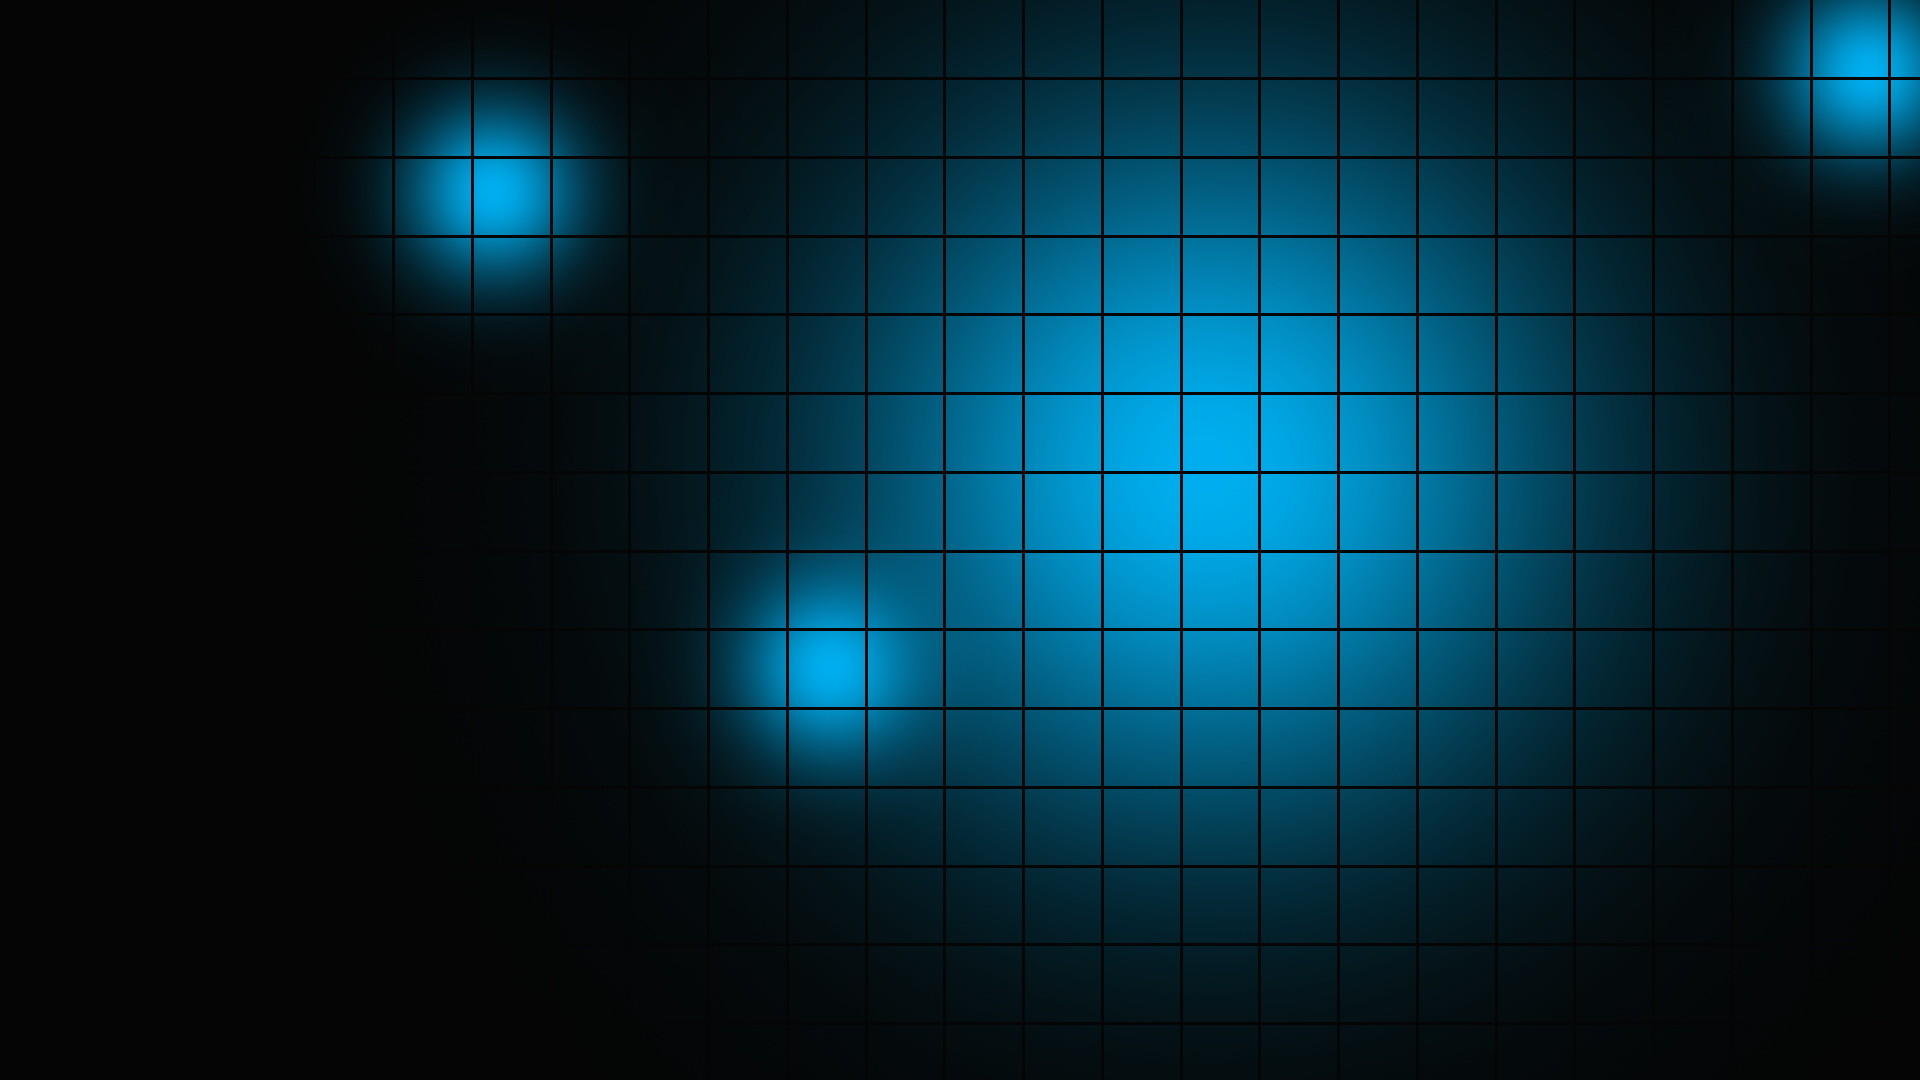 1920x1080 Blue Dragon HD Wallpapers 1 #BlueDragonHDWallpapers #BlueDragon #hdwallpapers #wallpapers